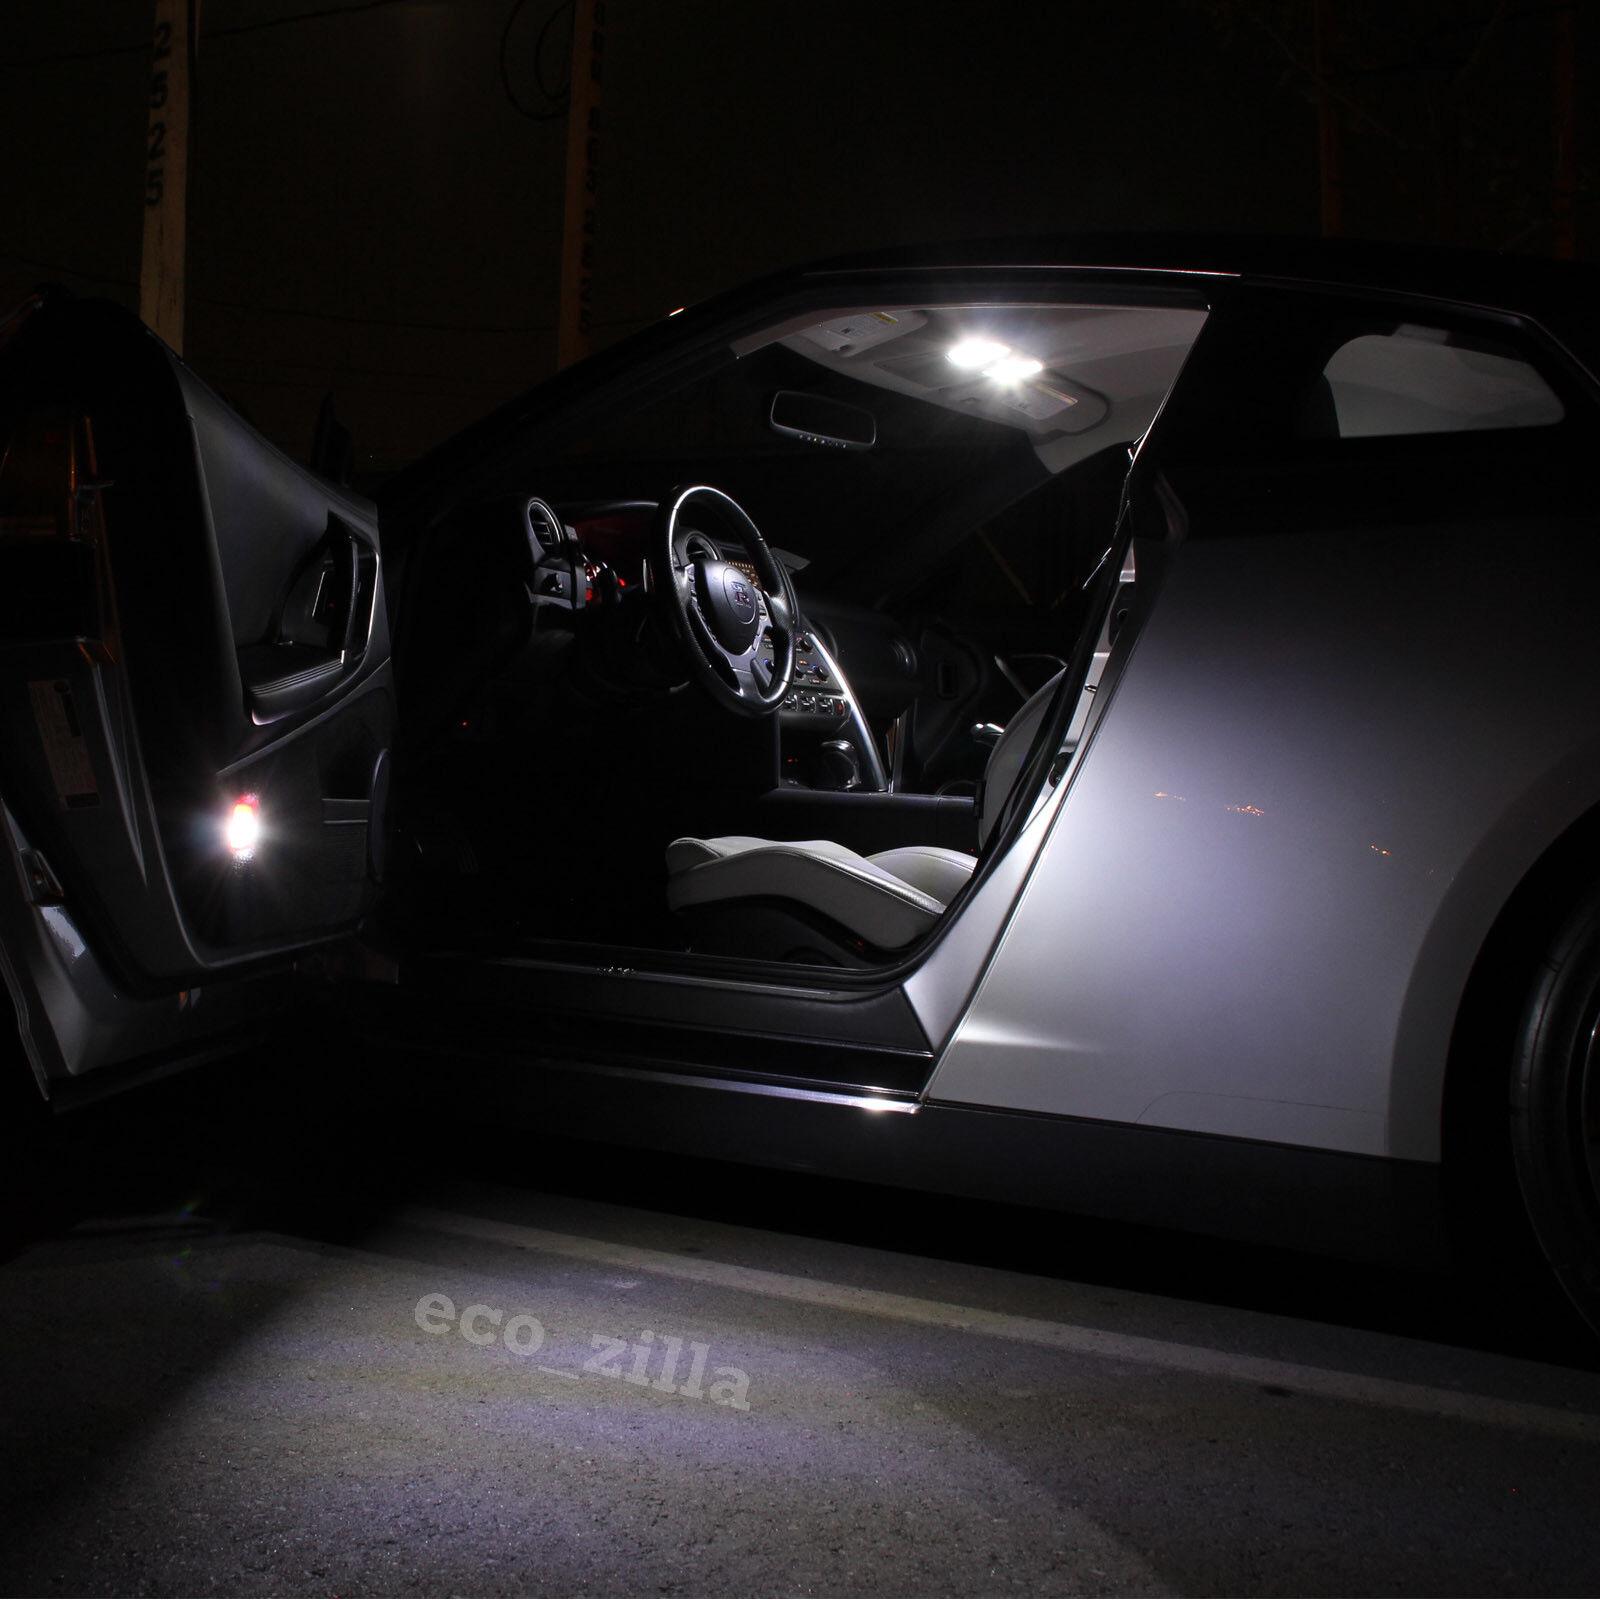 Acura Mdx Accessories >> For 2007 2013 Acura Mdx White Led Interior Light Accessories